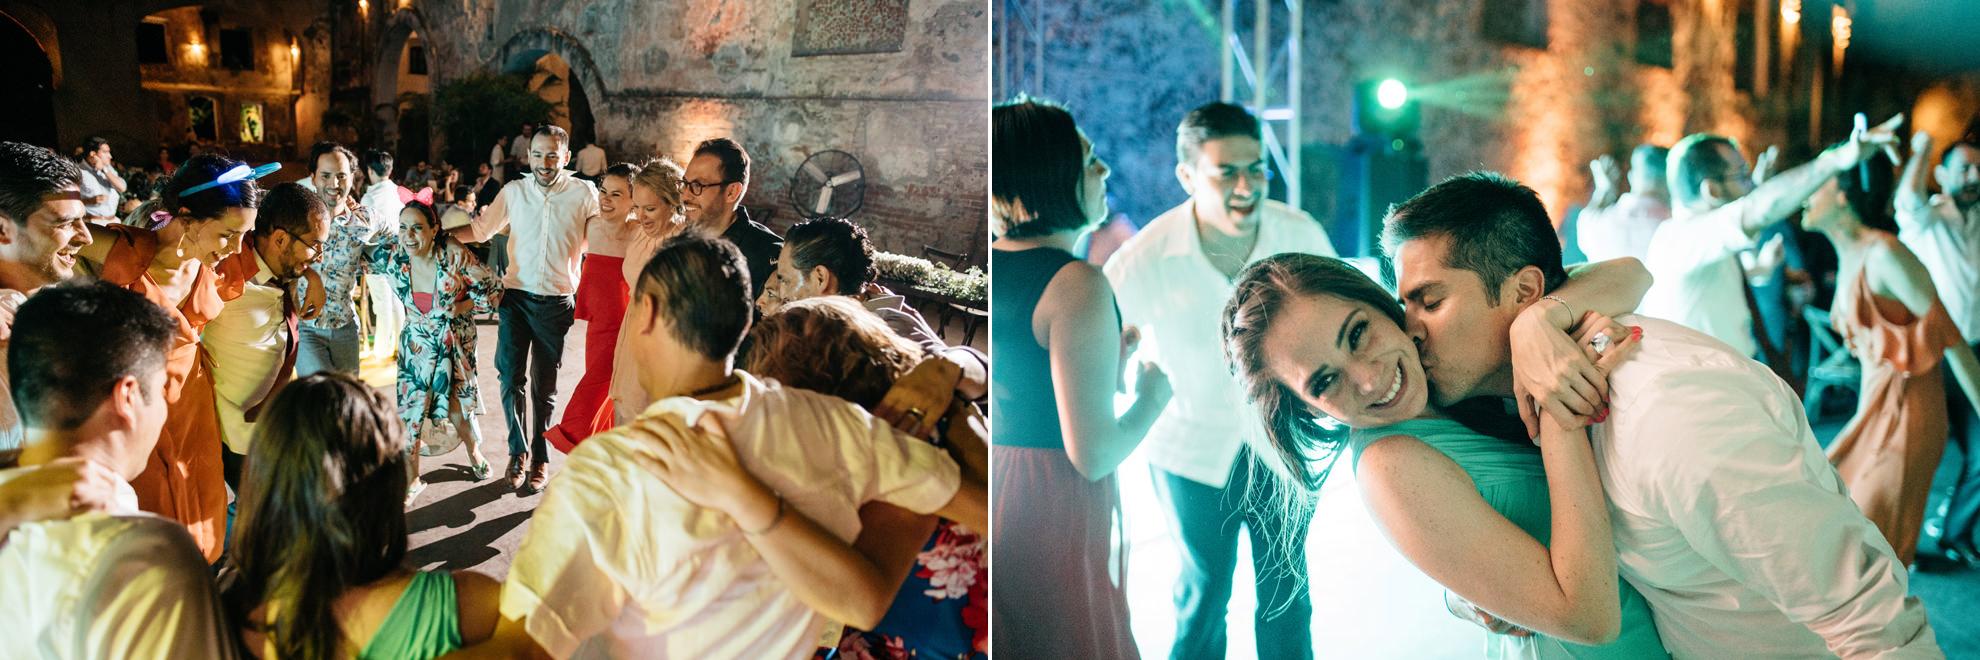 117 - wedding hacienda san carlos.jpg